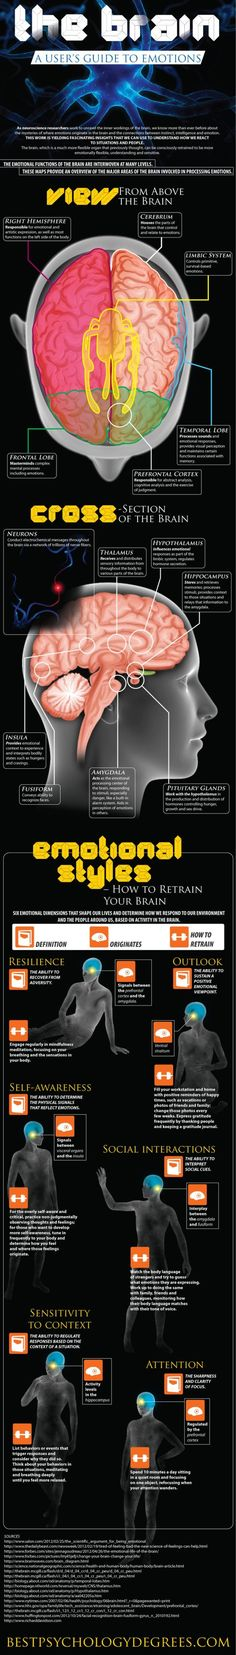 the brain emotions